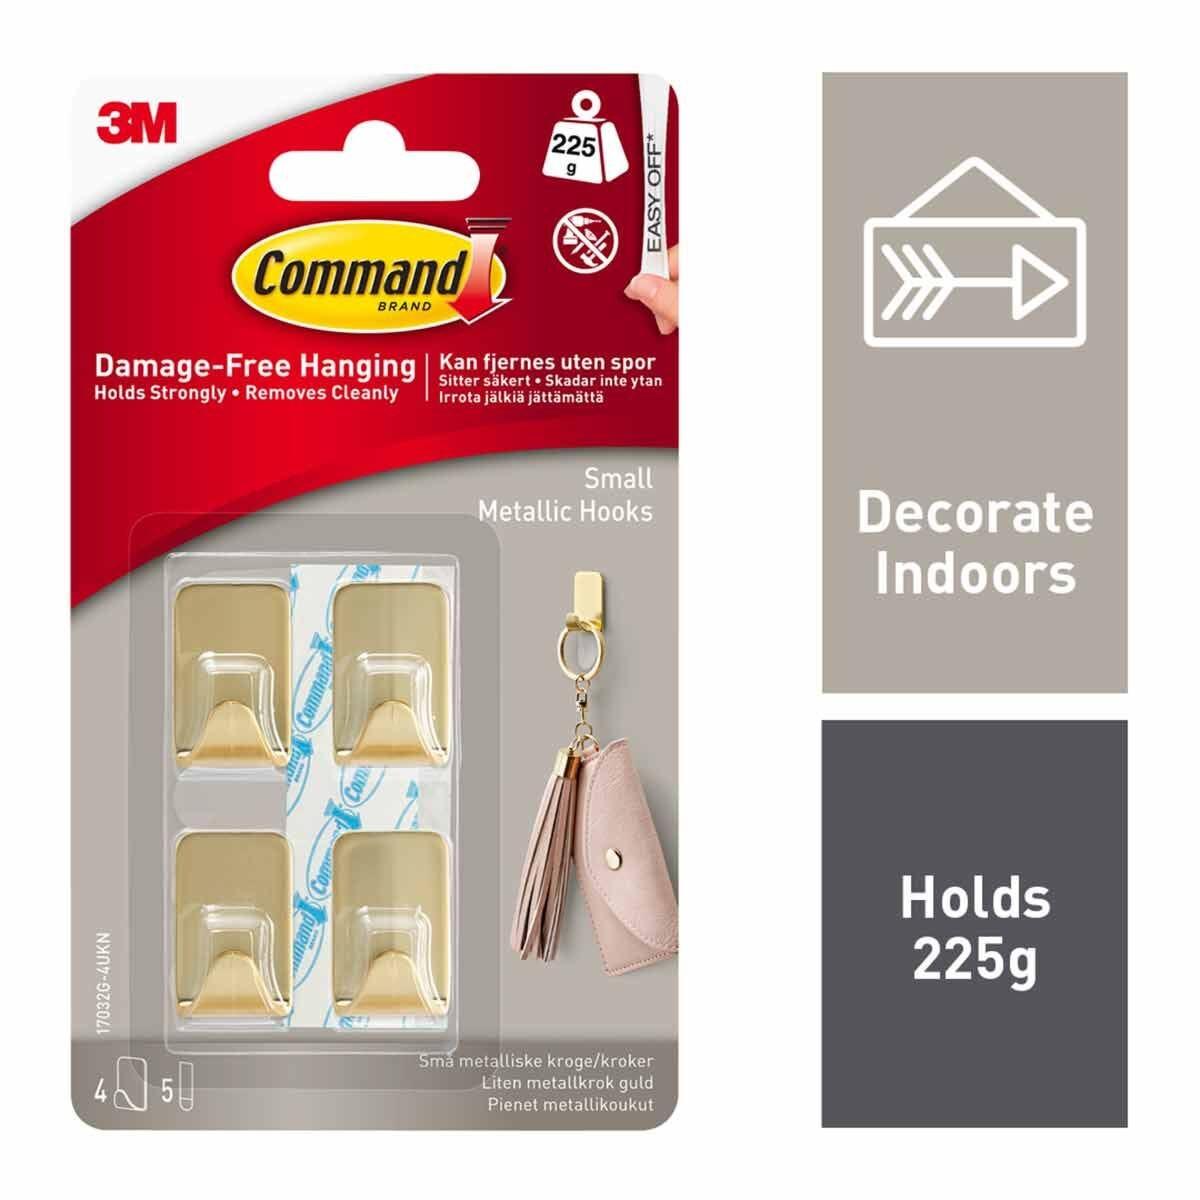 Command Metallic Hooks Small Pack of 4 Brass